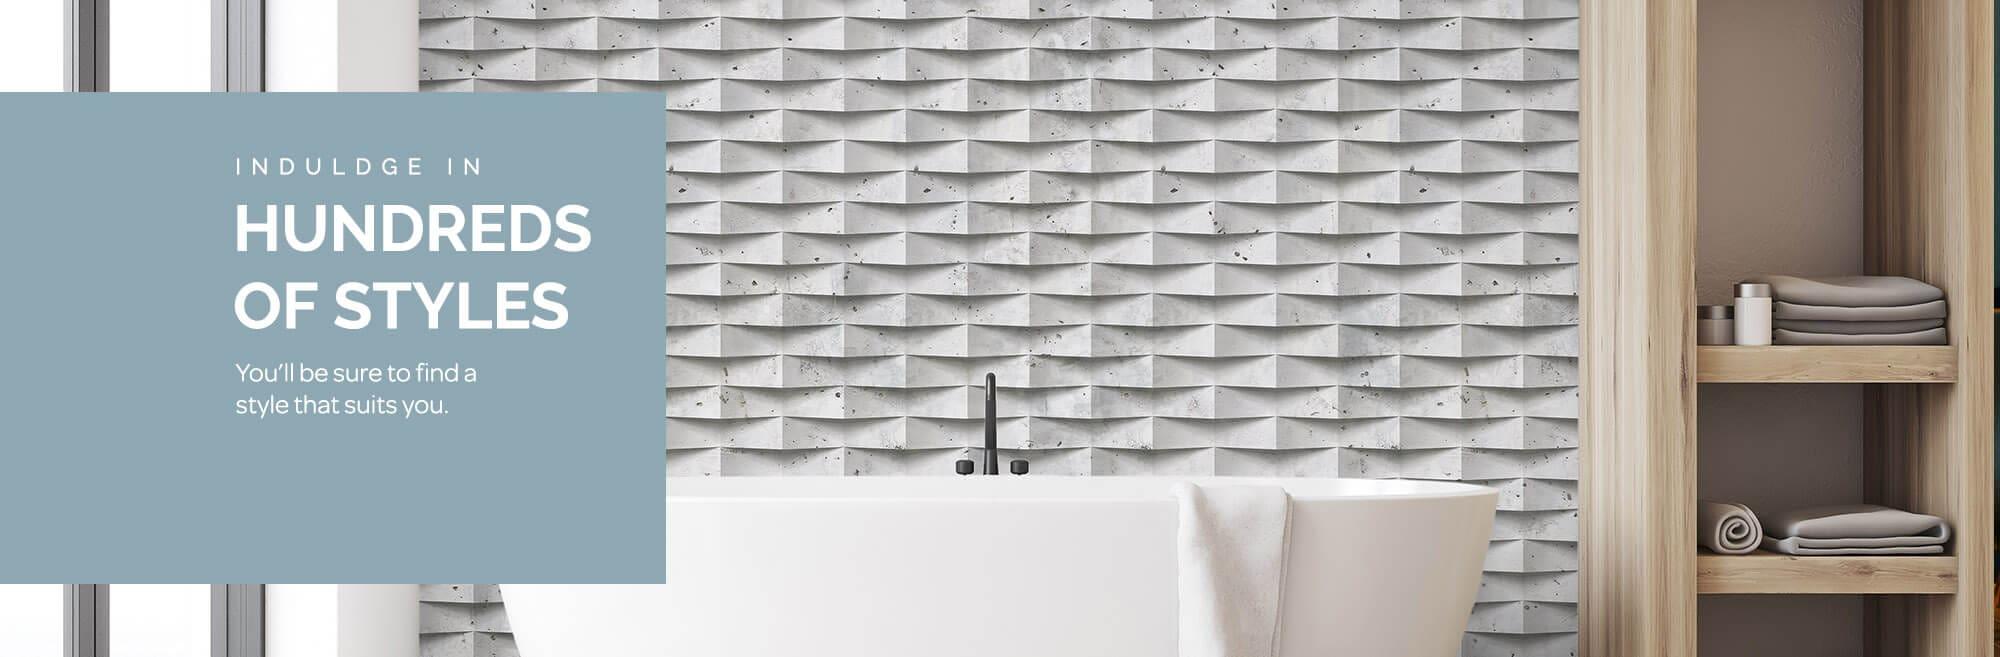 PVC Wall Cladding - Targwall